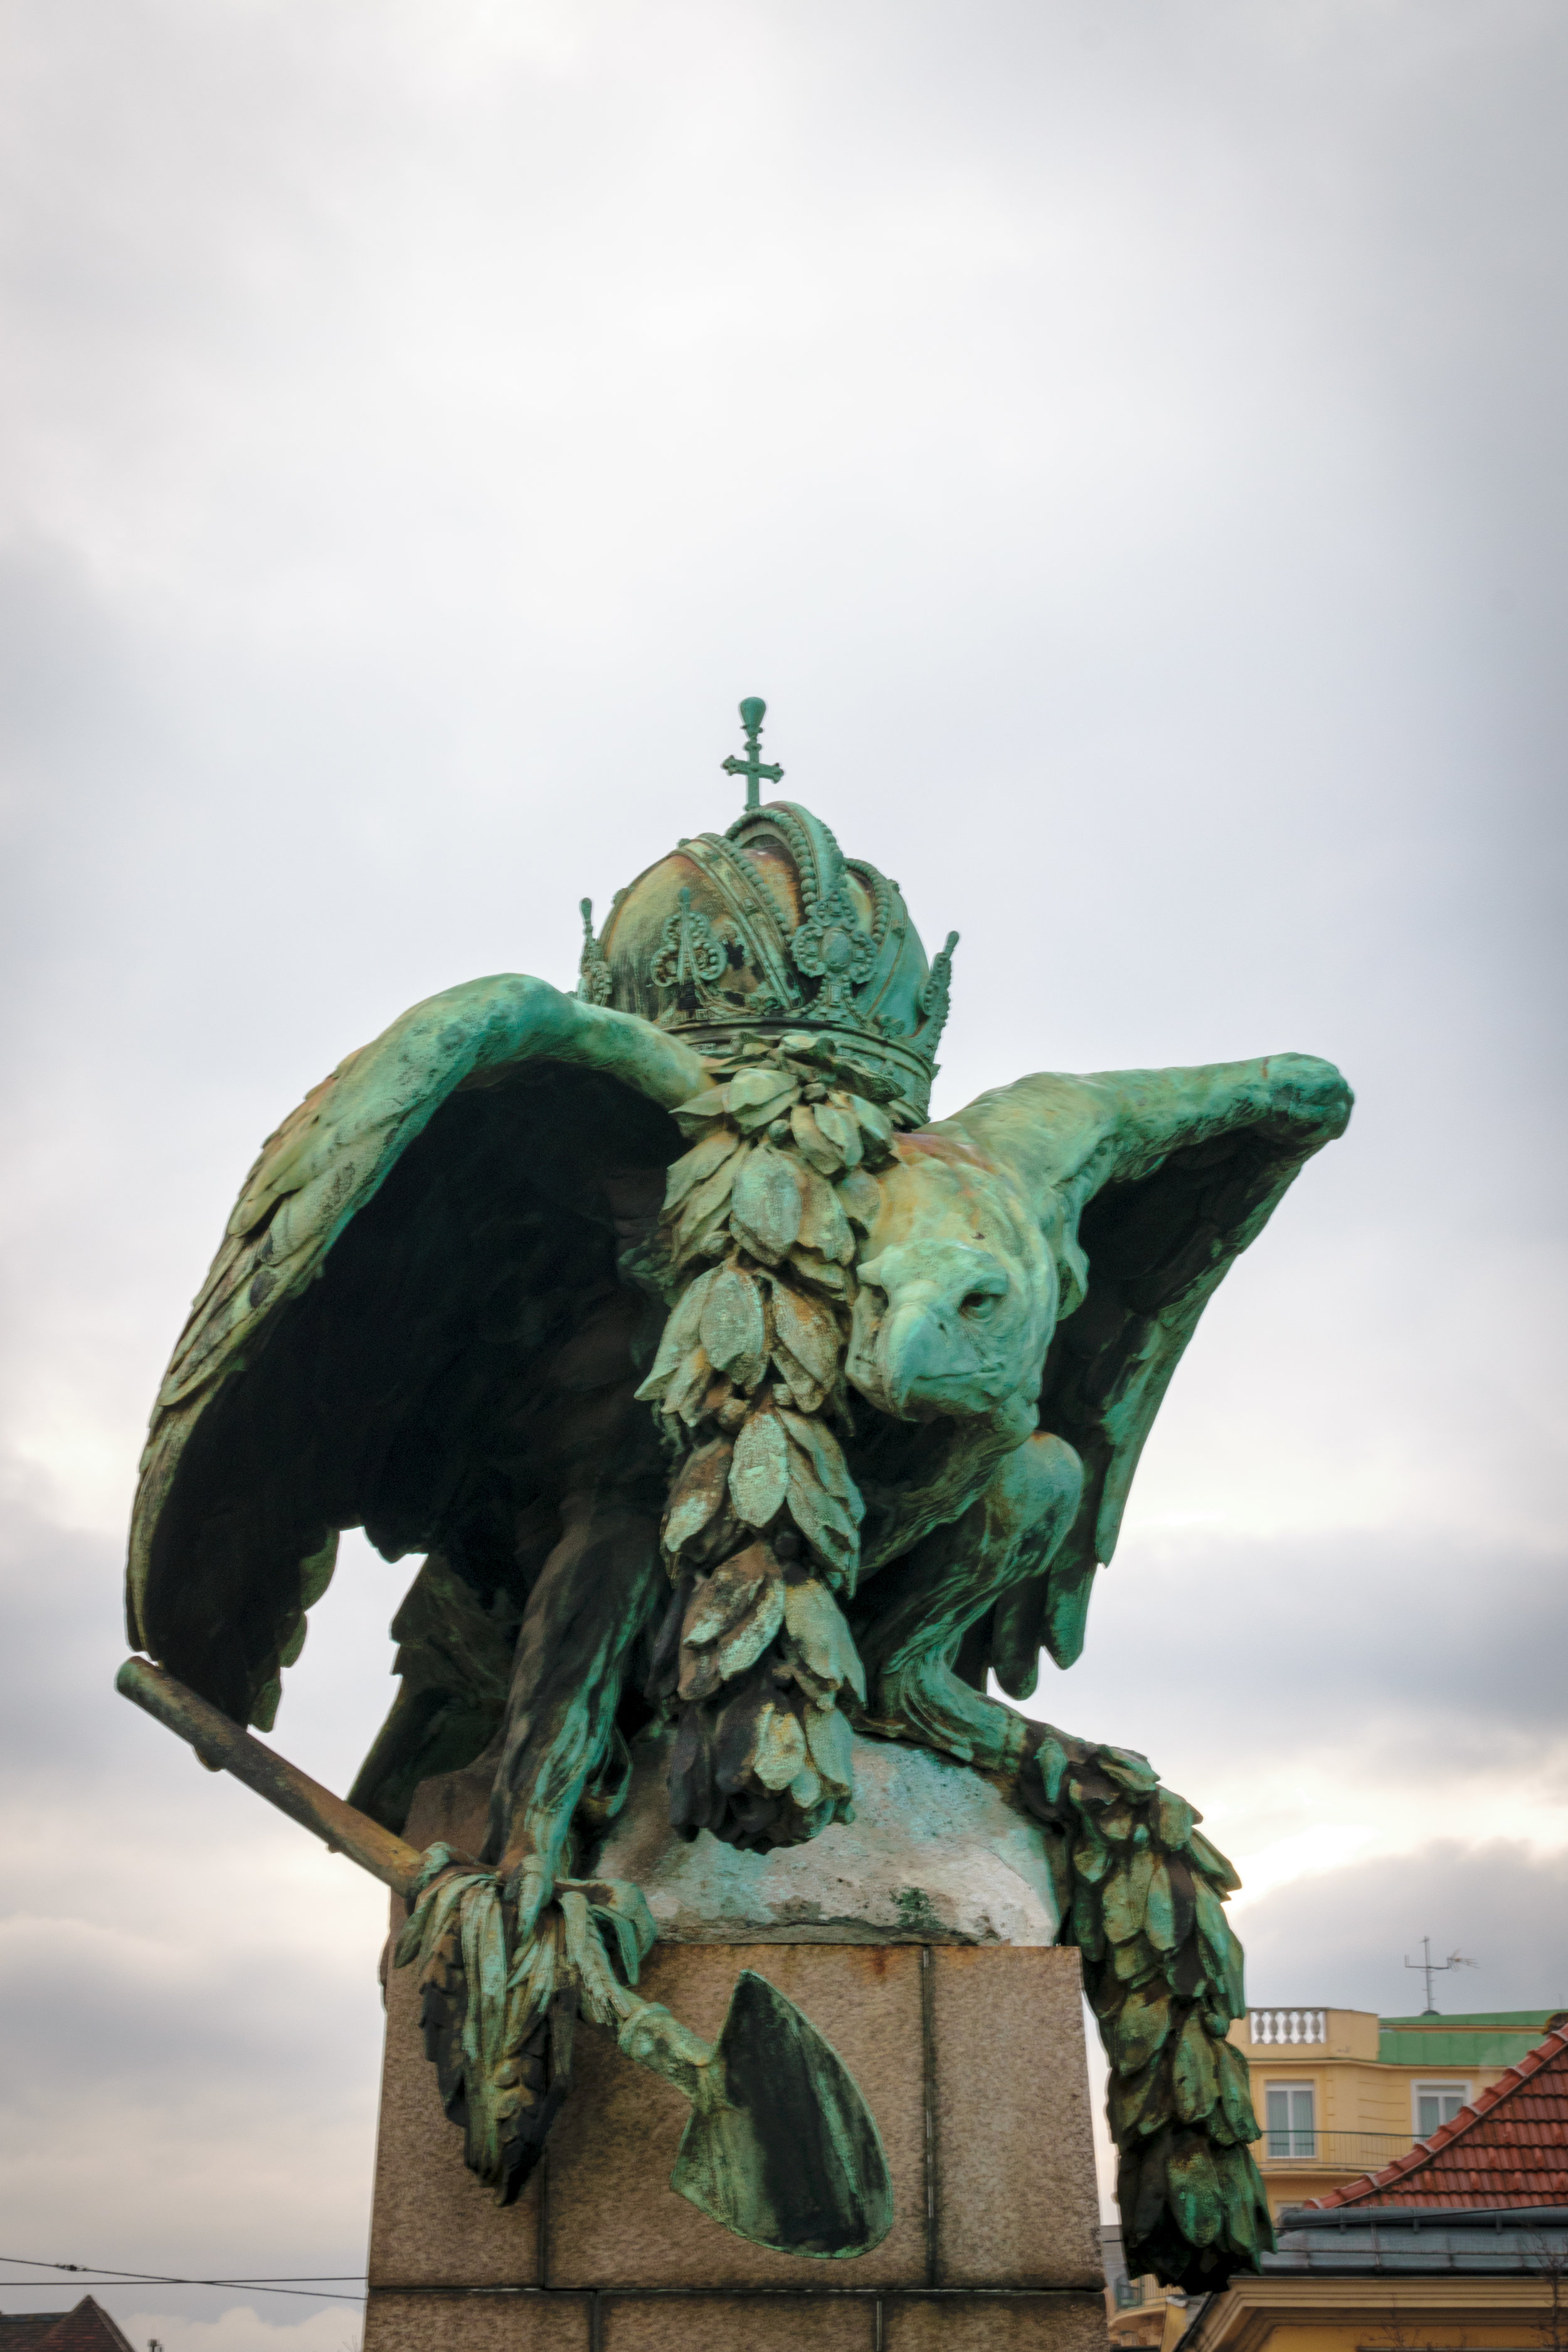 a royal eagle rests on a bridge